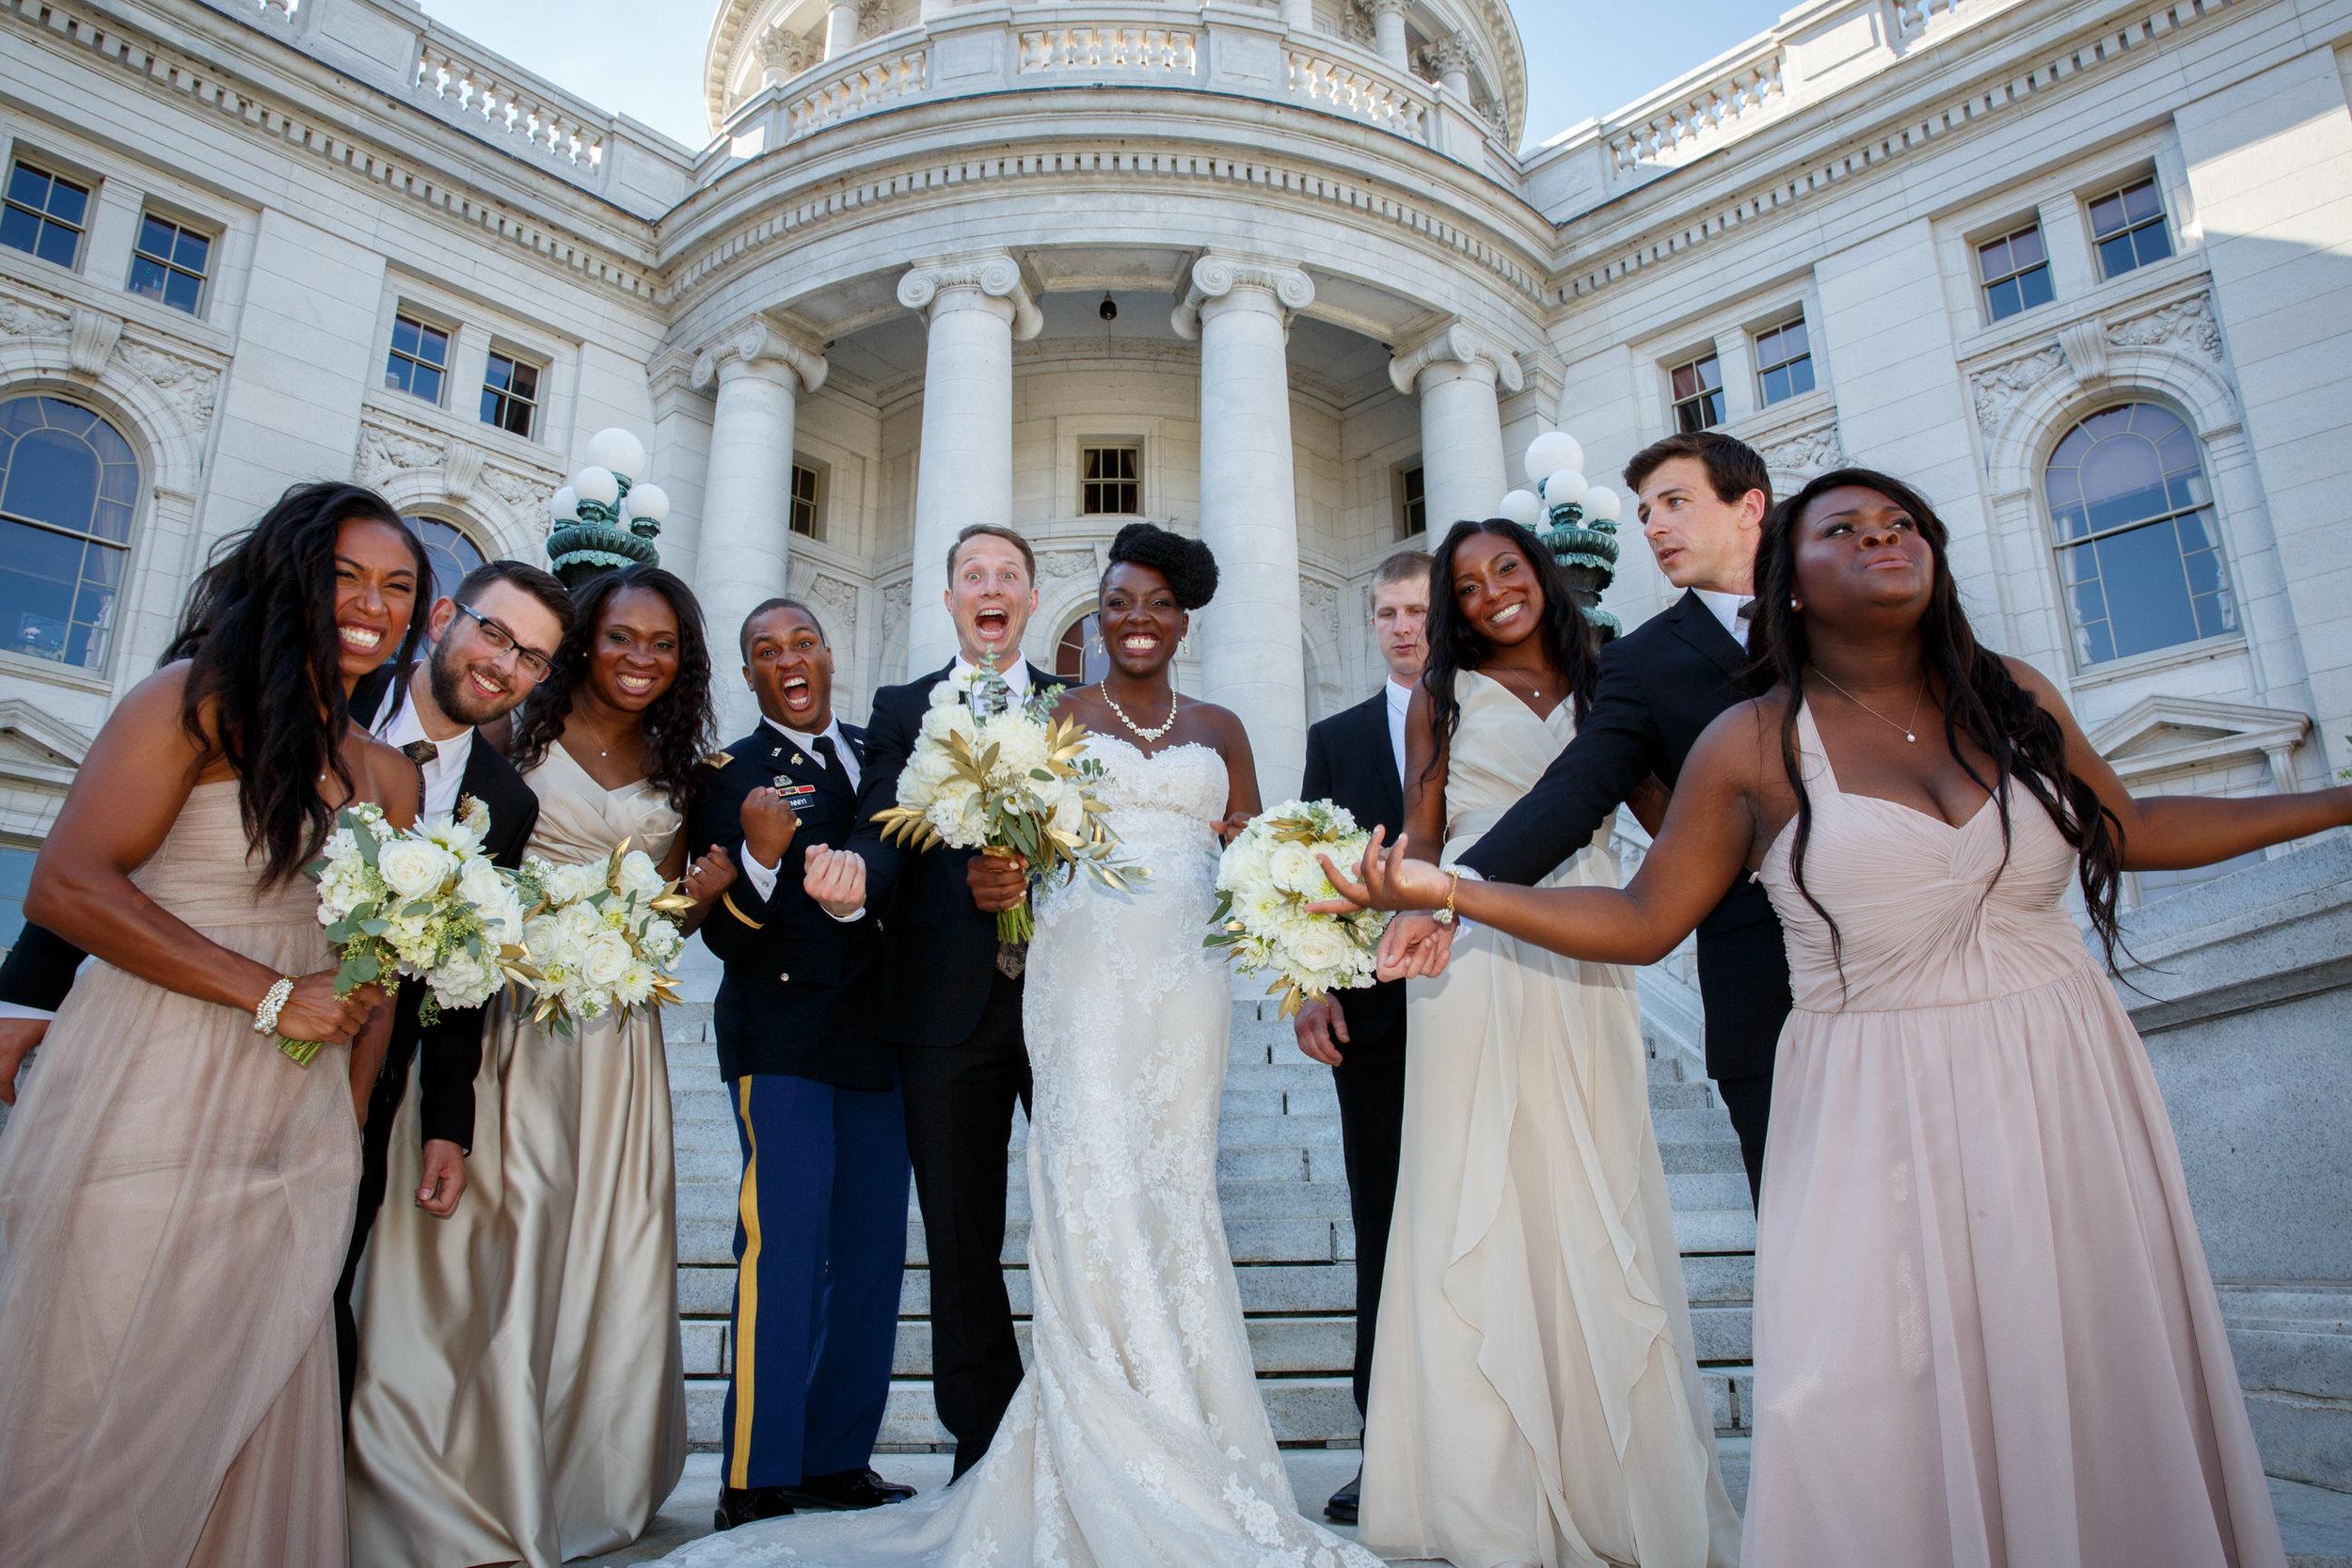 Dorcas & Ian Brian Milo wedding photography (146 of 109).jpg